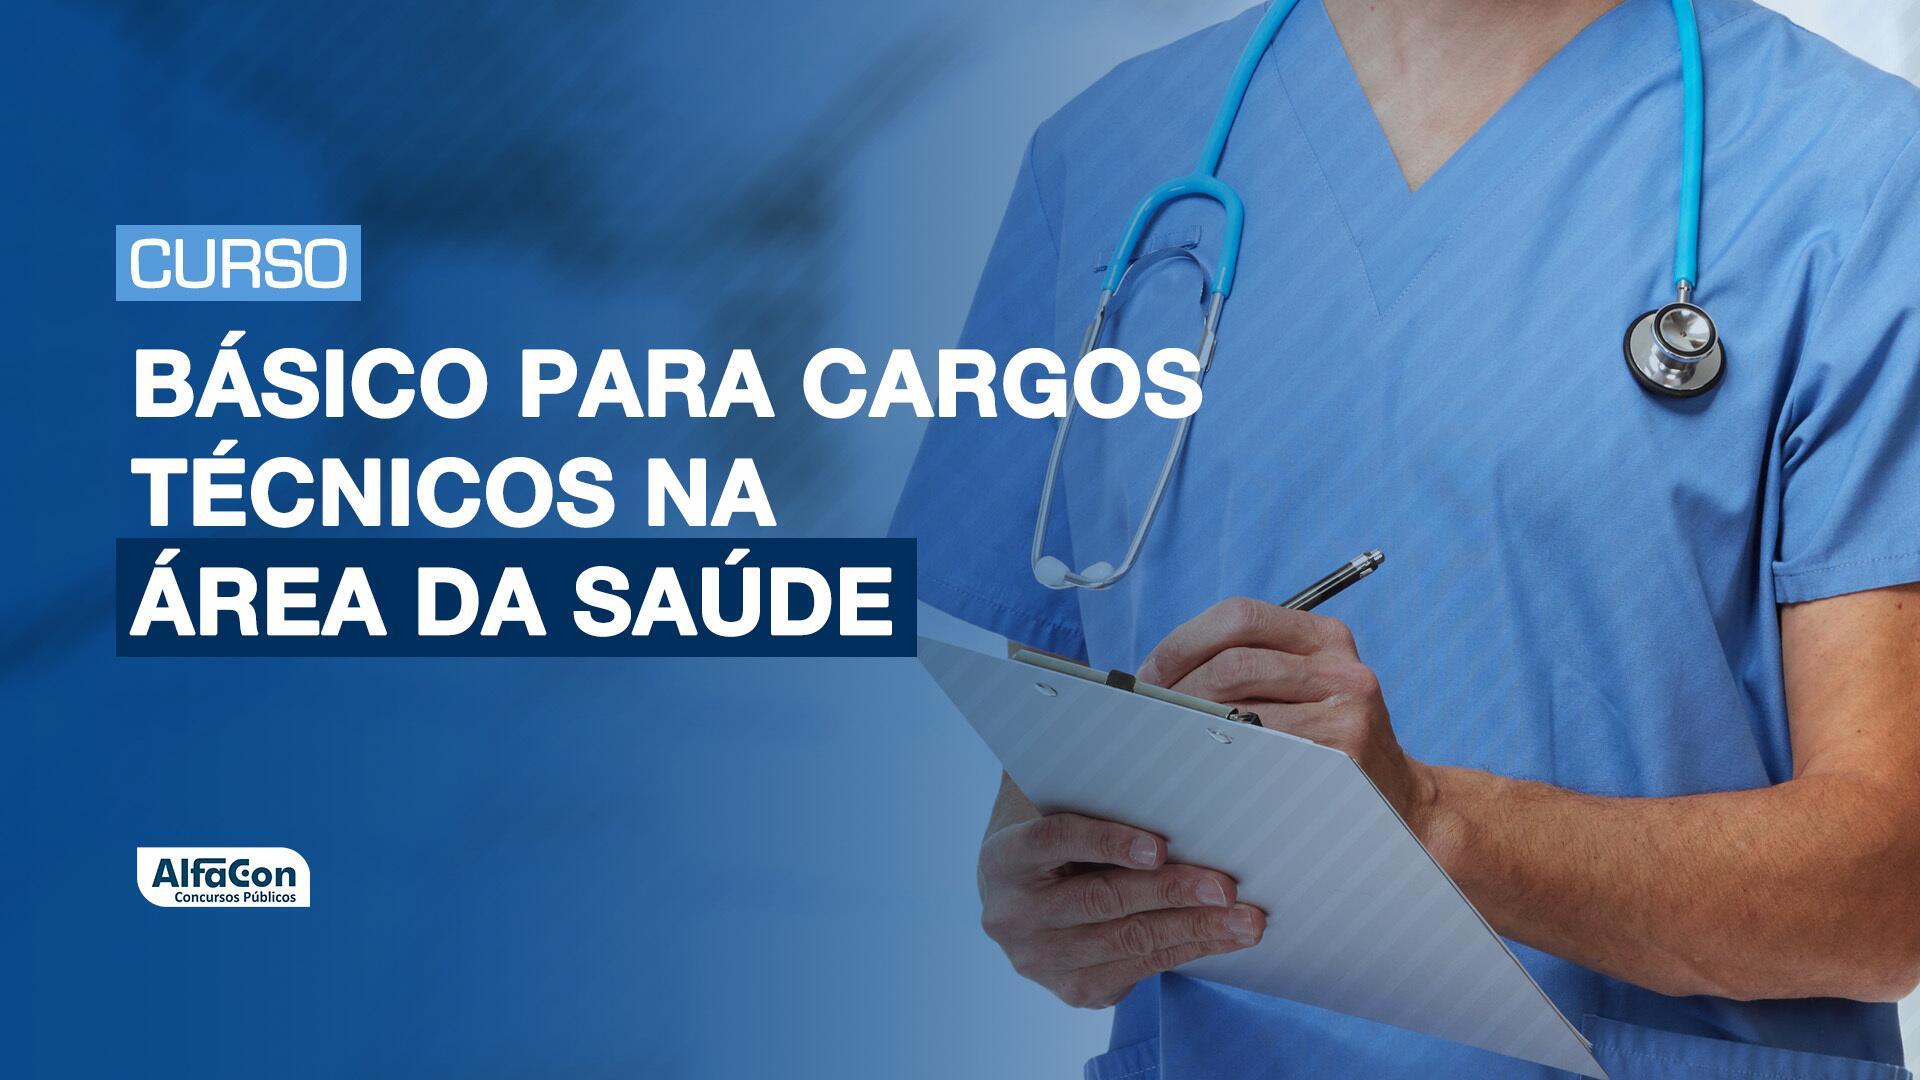 Básico para Cargos Técnicos na Área da Saúde